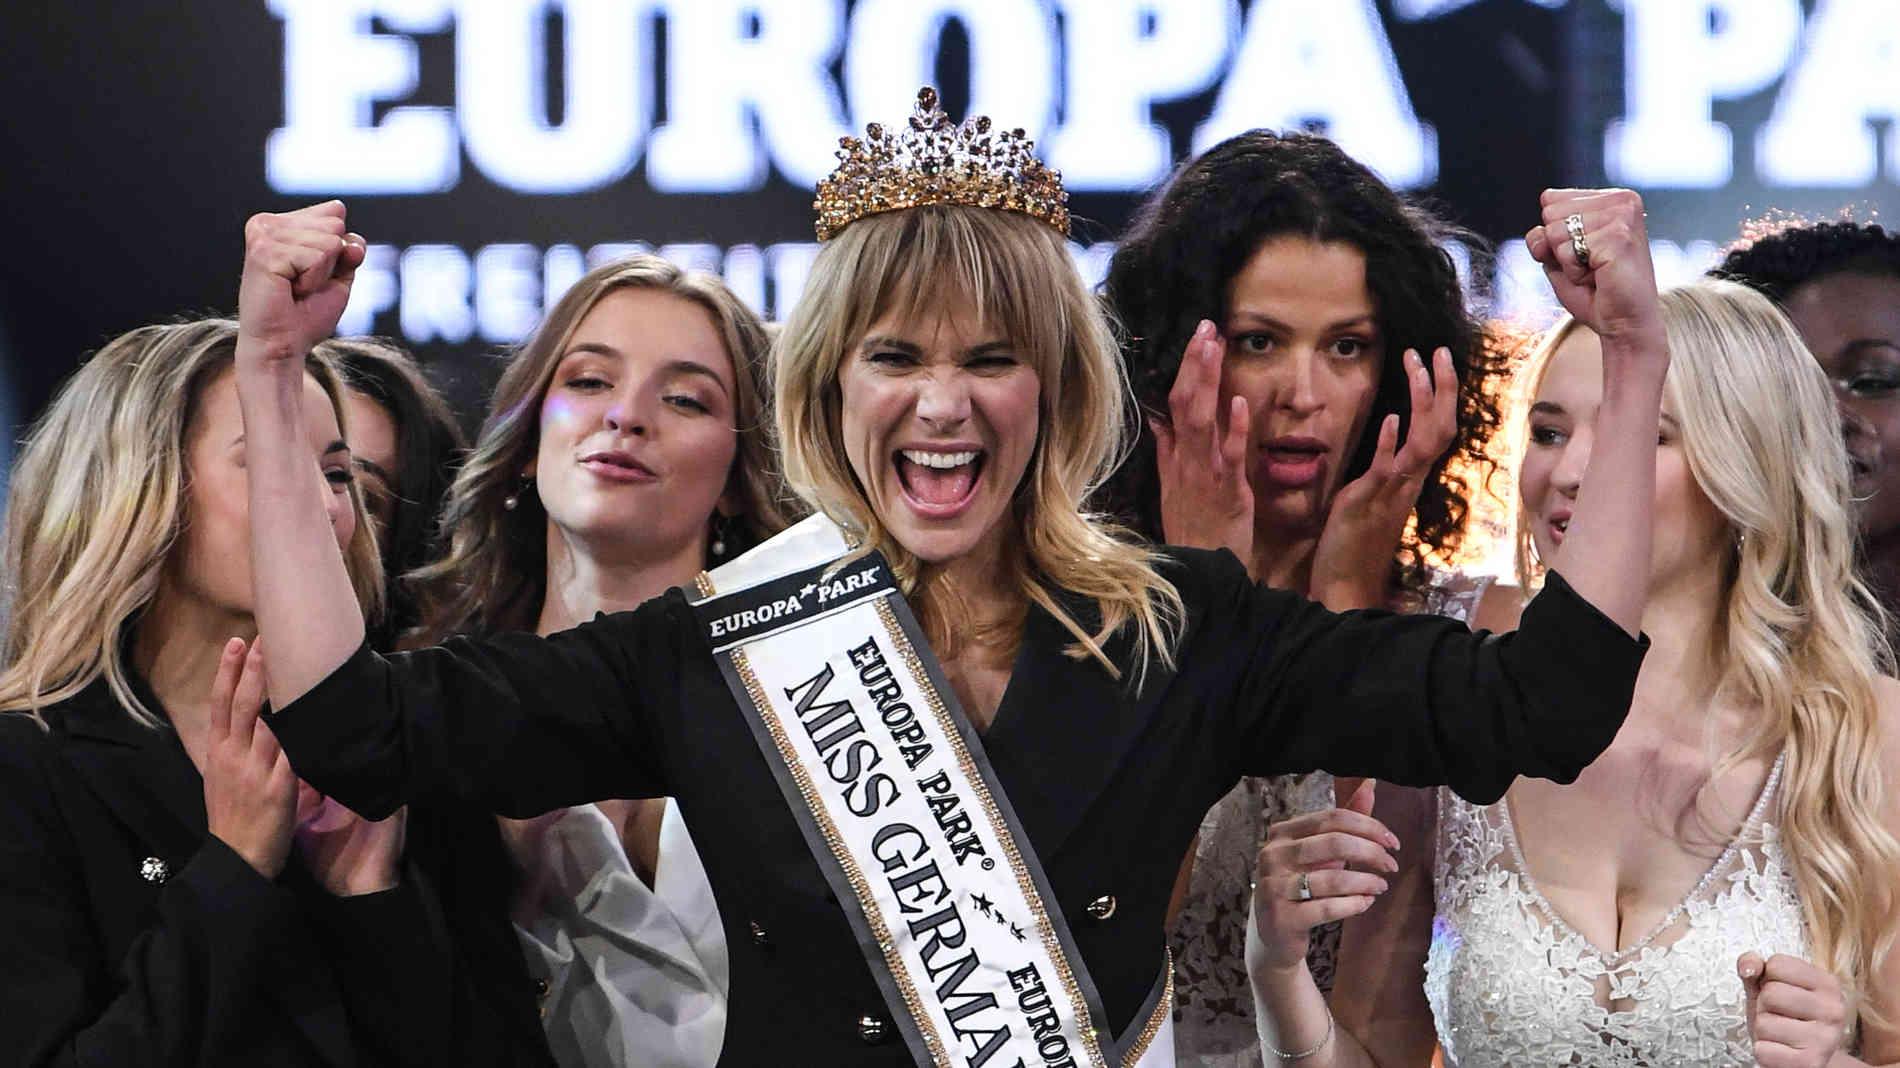 Leonie Charlotte von Hase se proclama Miss Alemania con 35 años